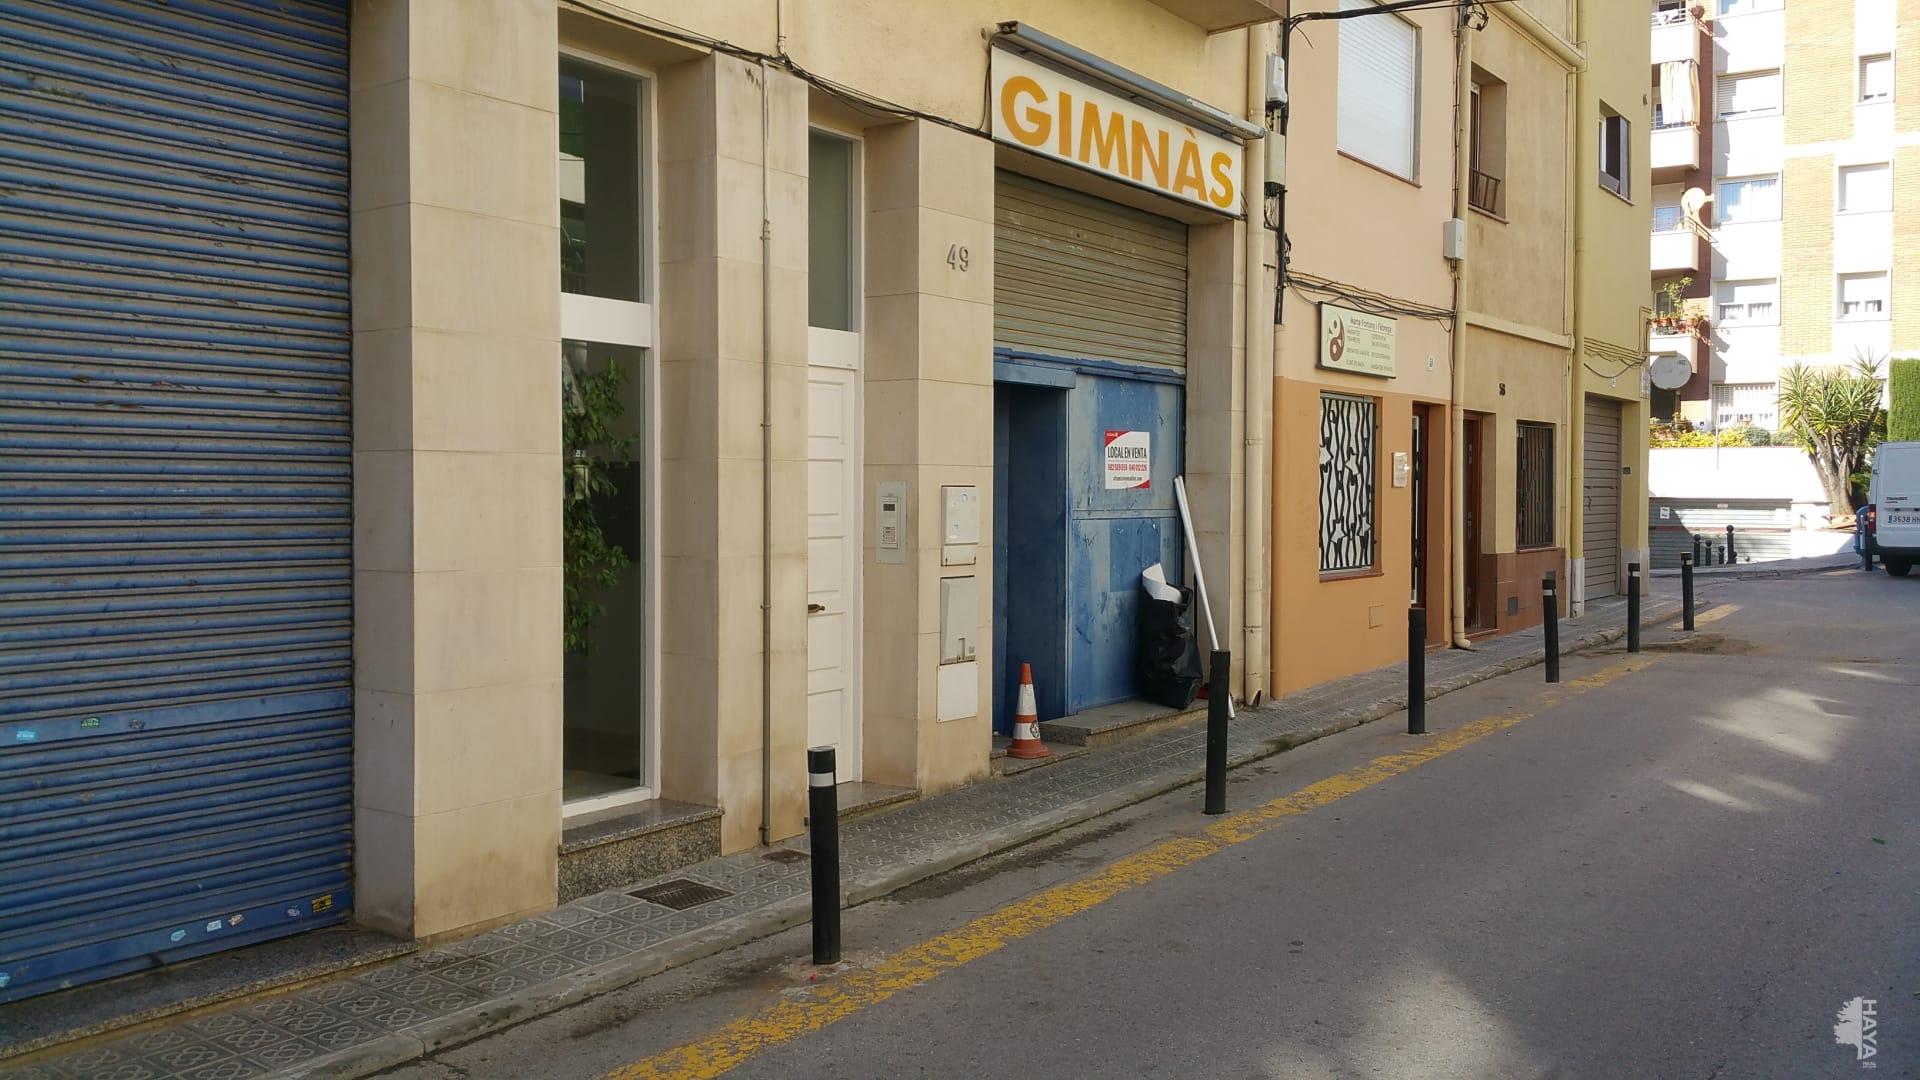 Local en venta en Arenys de Mar, Arenys de Mar, Barcelona, Calle Sant Gabriel, 269.407 €, 215 m2